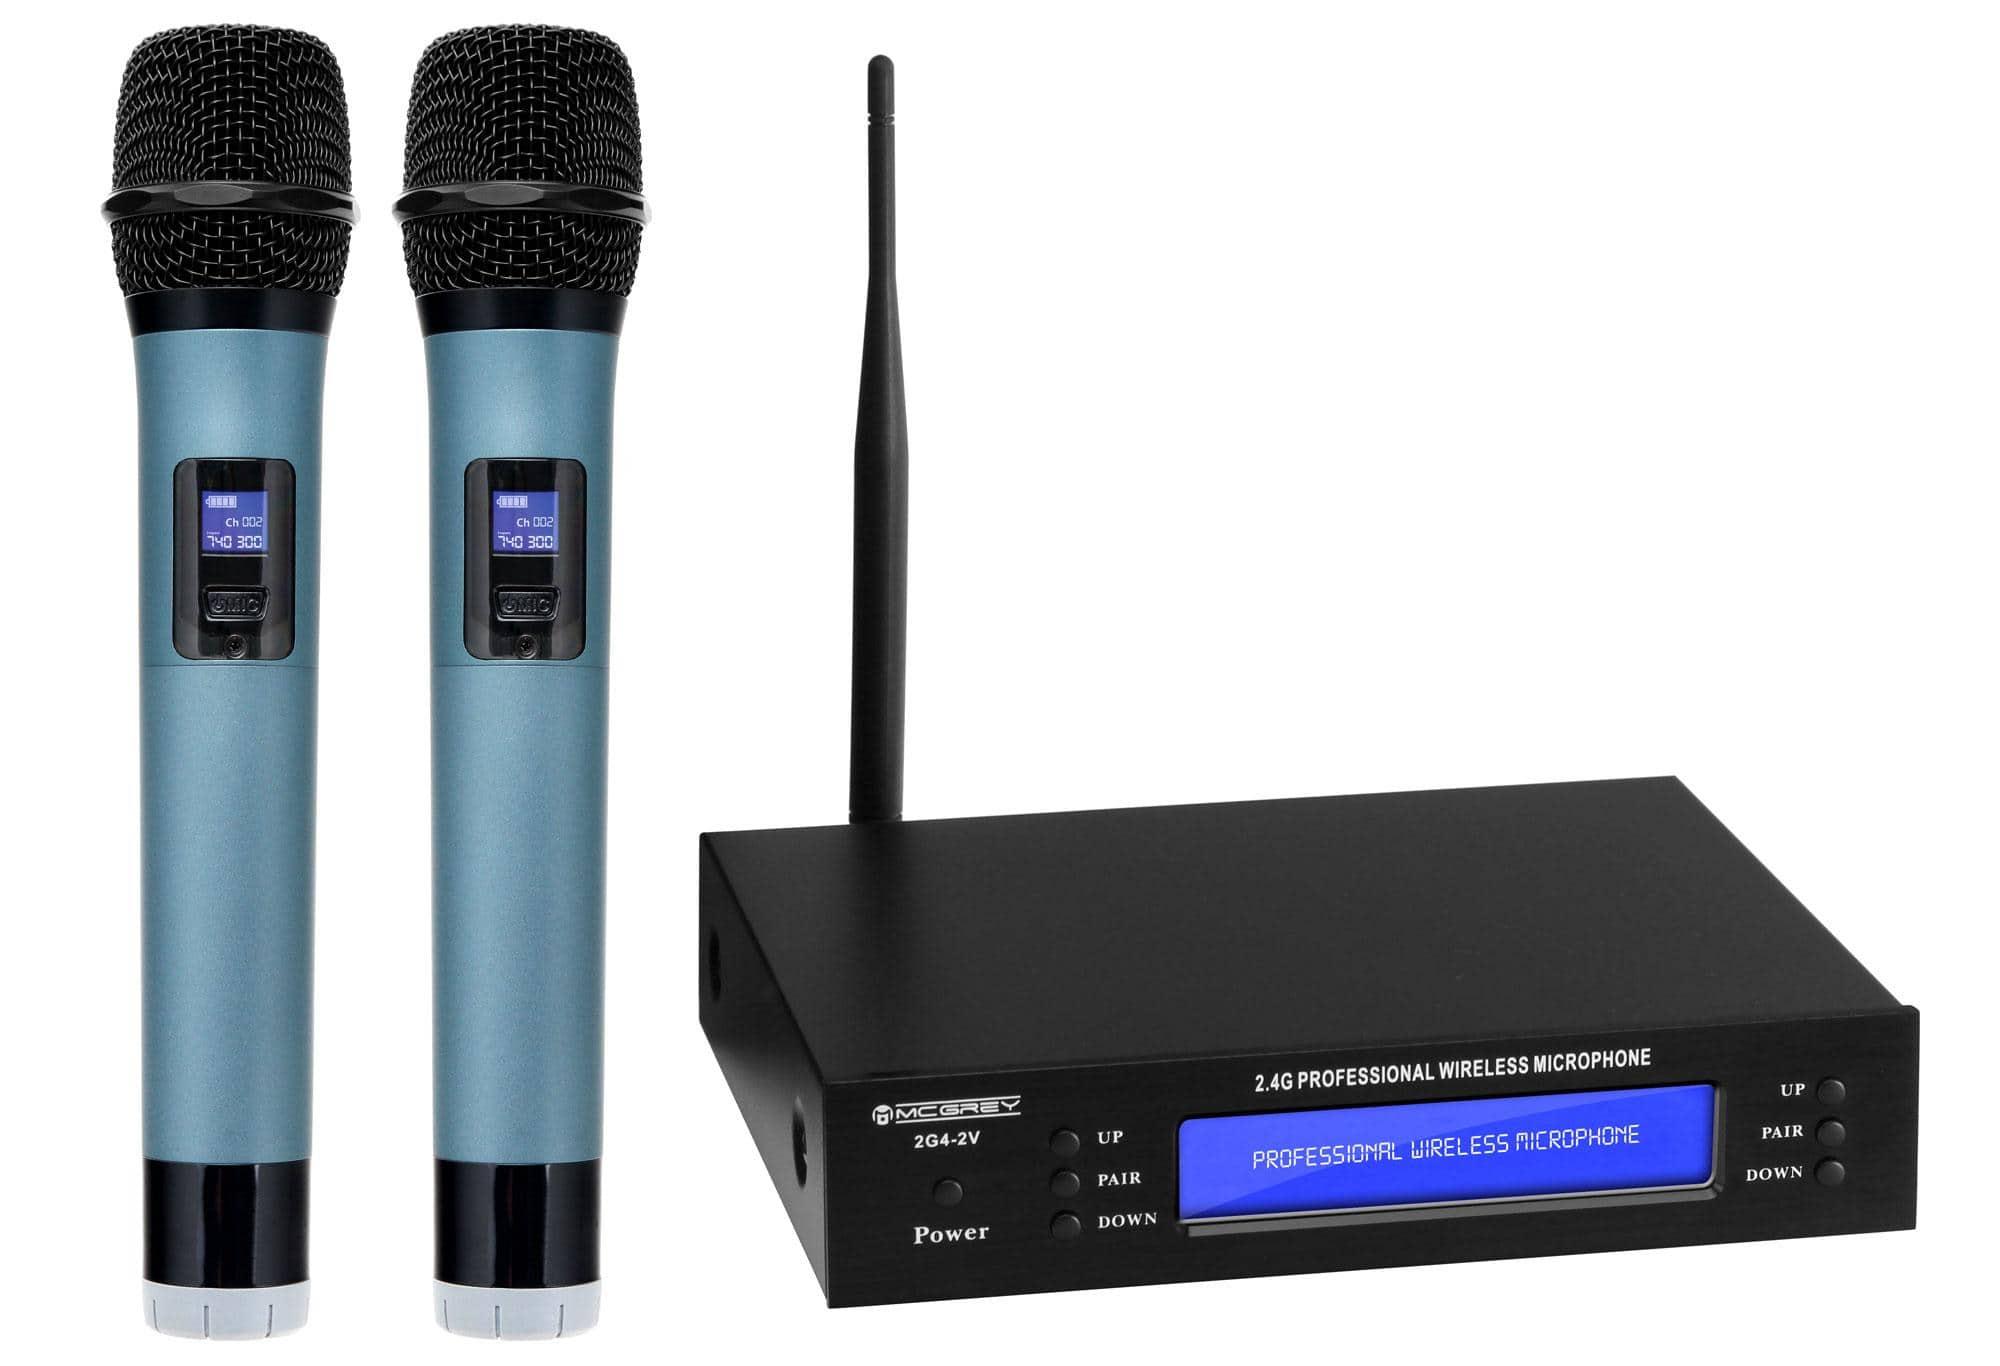 mcgrey 2g4 2v dual vocal wireless microphone set with 2x handheld microphones 50 m. Black Bedroom Furniture Sets. Home Design Ideas